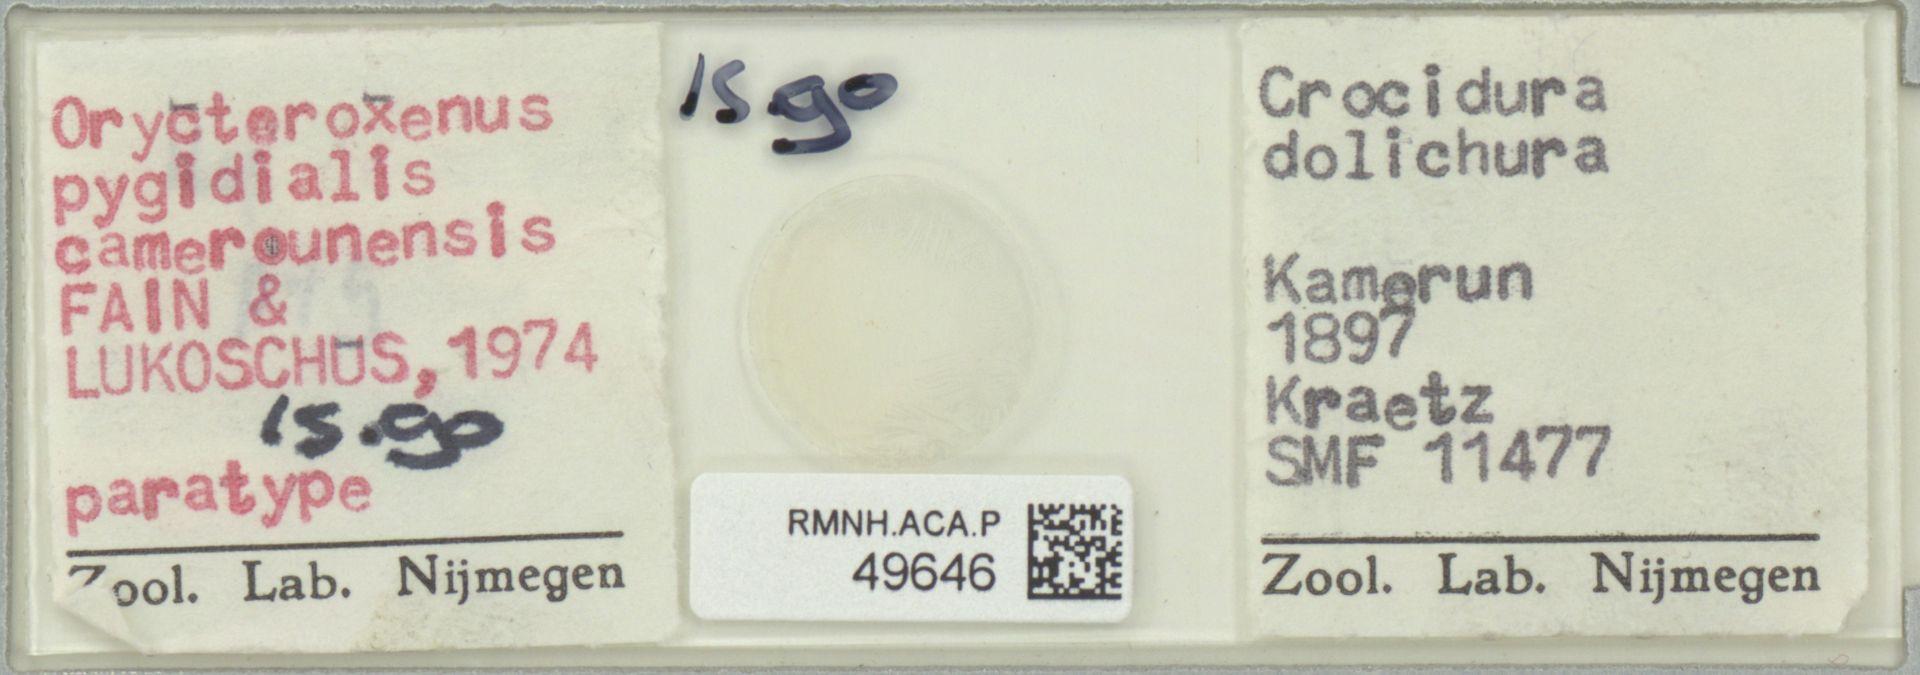 RMNH.ACA.P.49646   Orycteroxenus pygidialis camerounensis Fain & Lukoschus, 1974